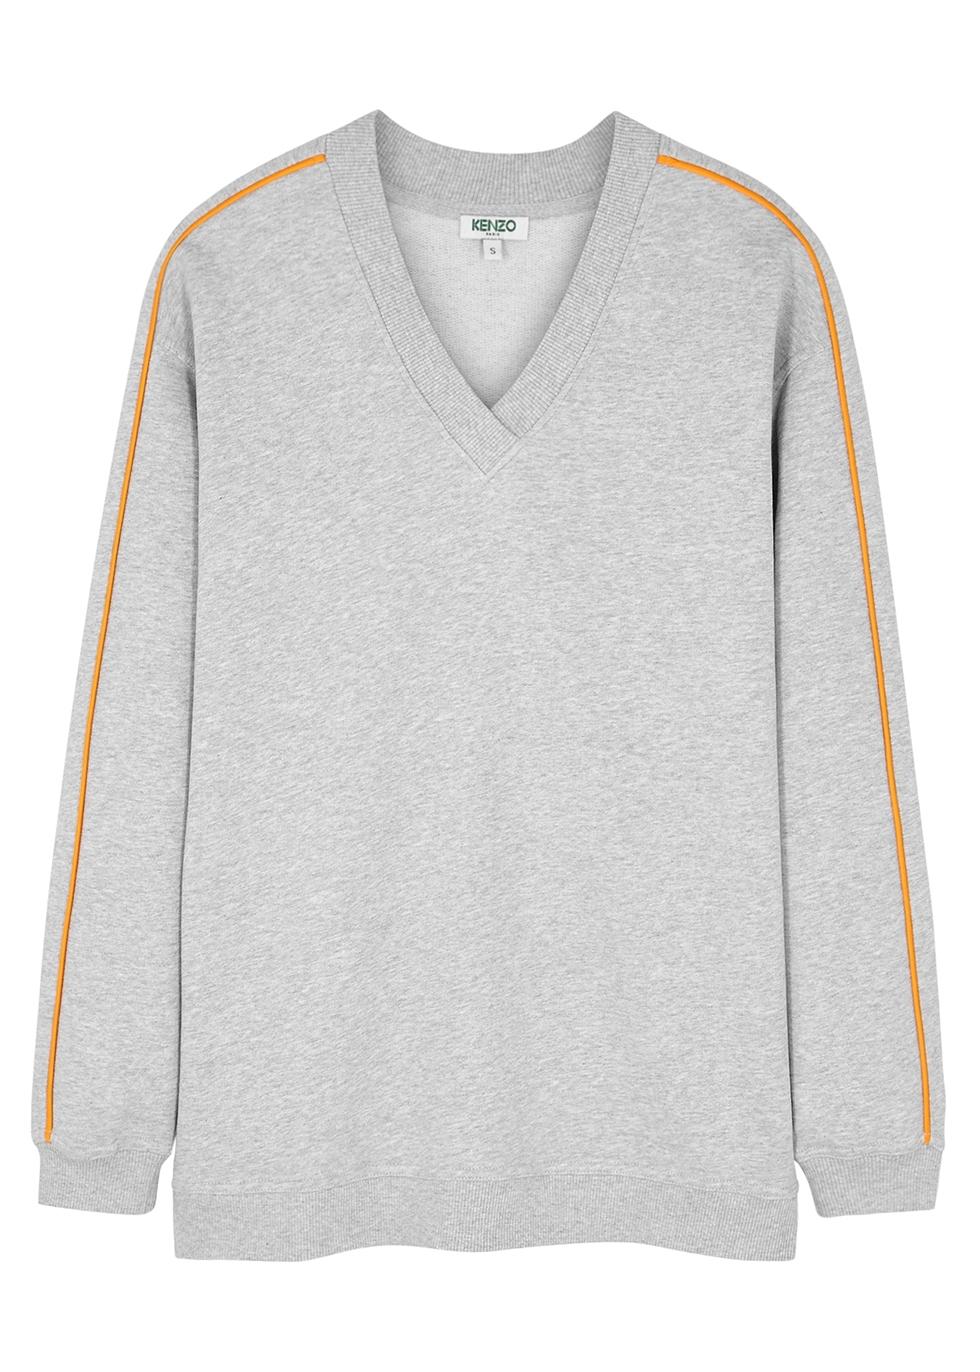 b689ddbad Kenzo - Designer Sweatshirts